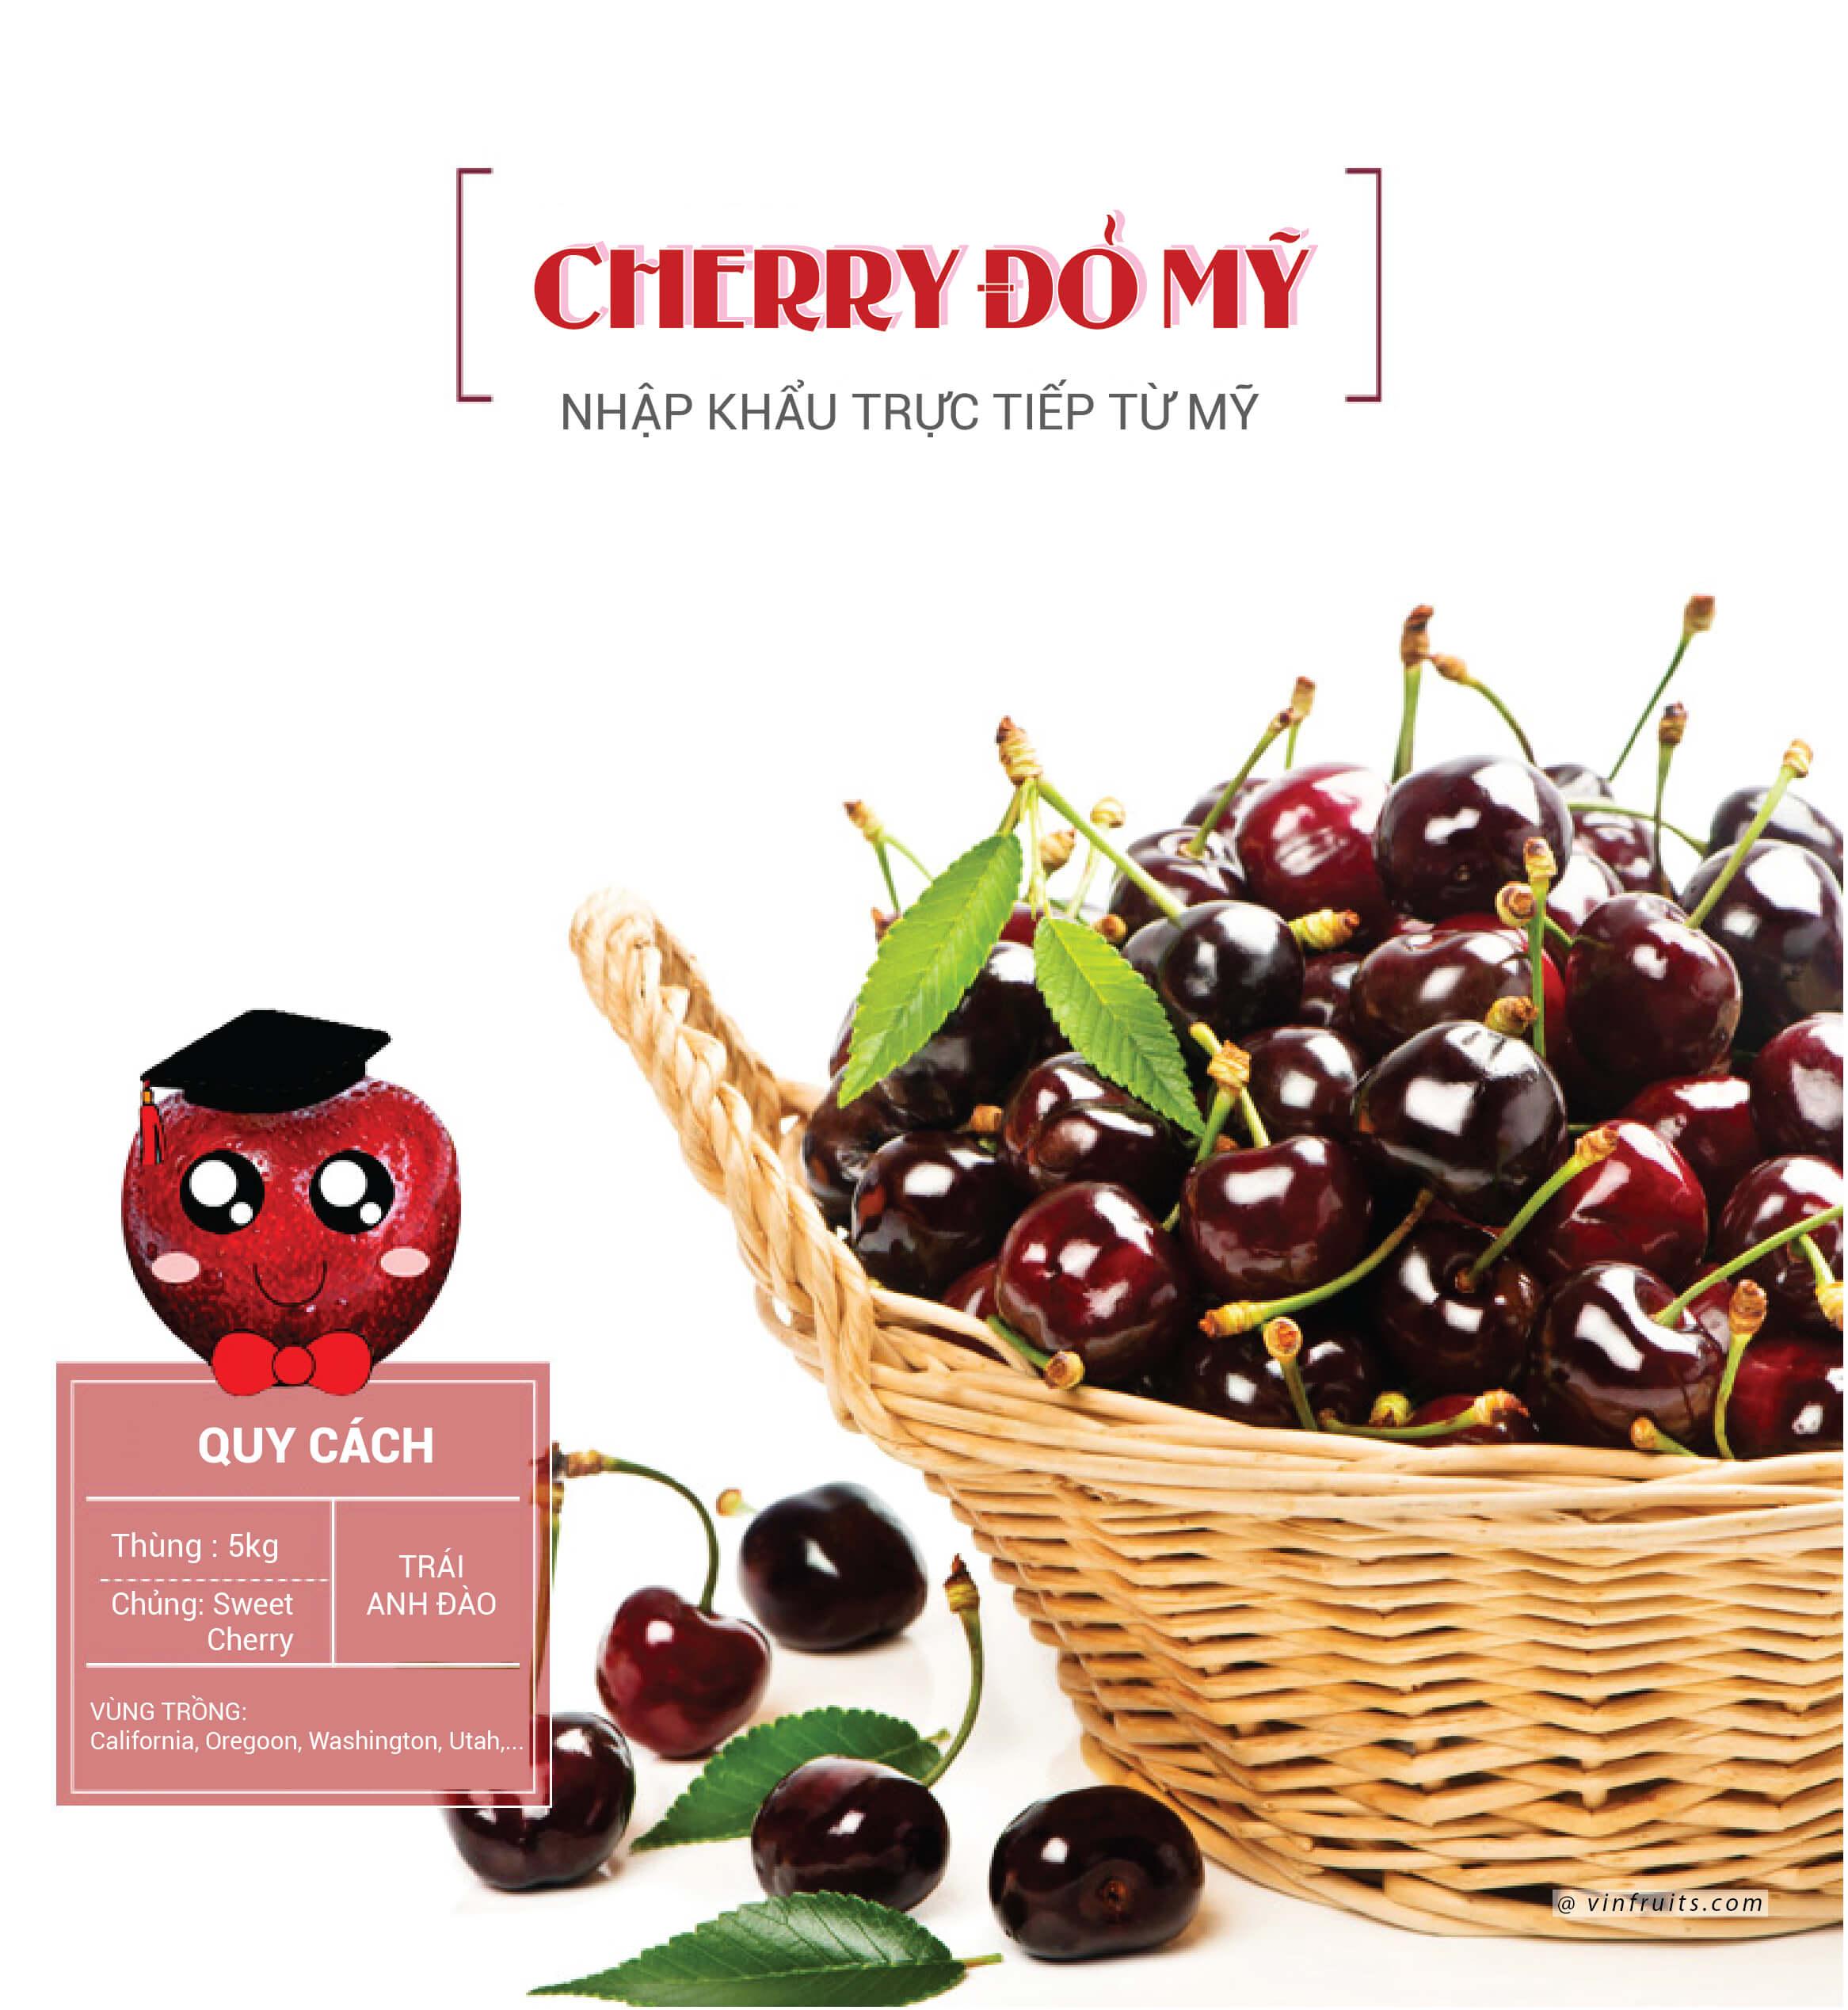 Giong cherry Mỹ - vinfruits.com 1